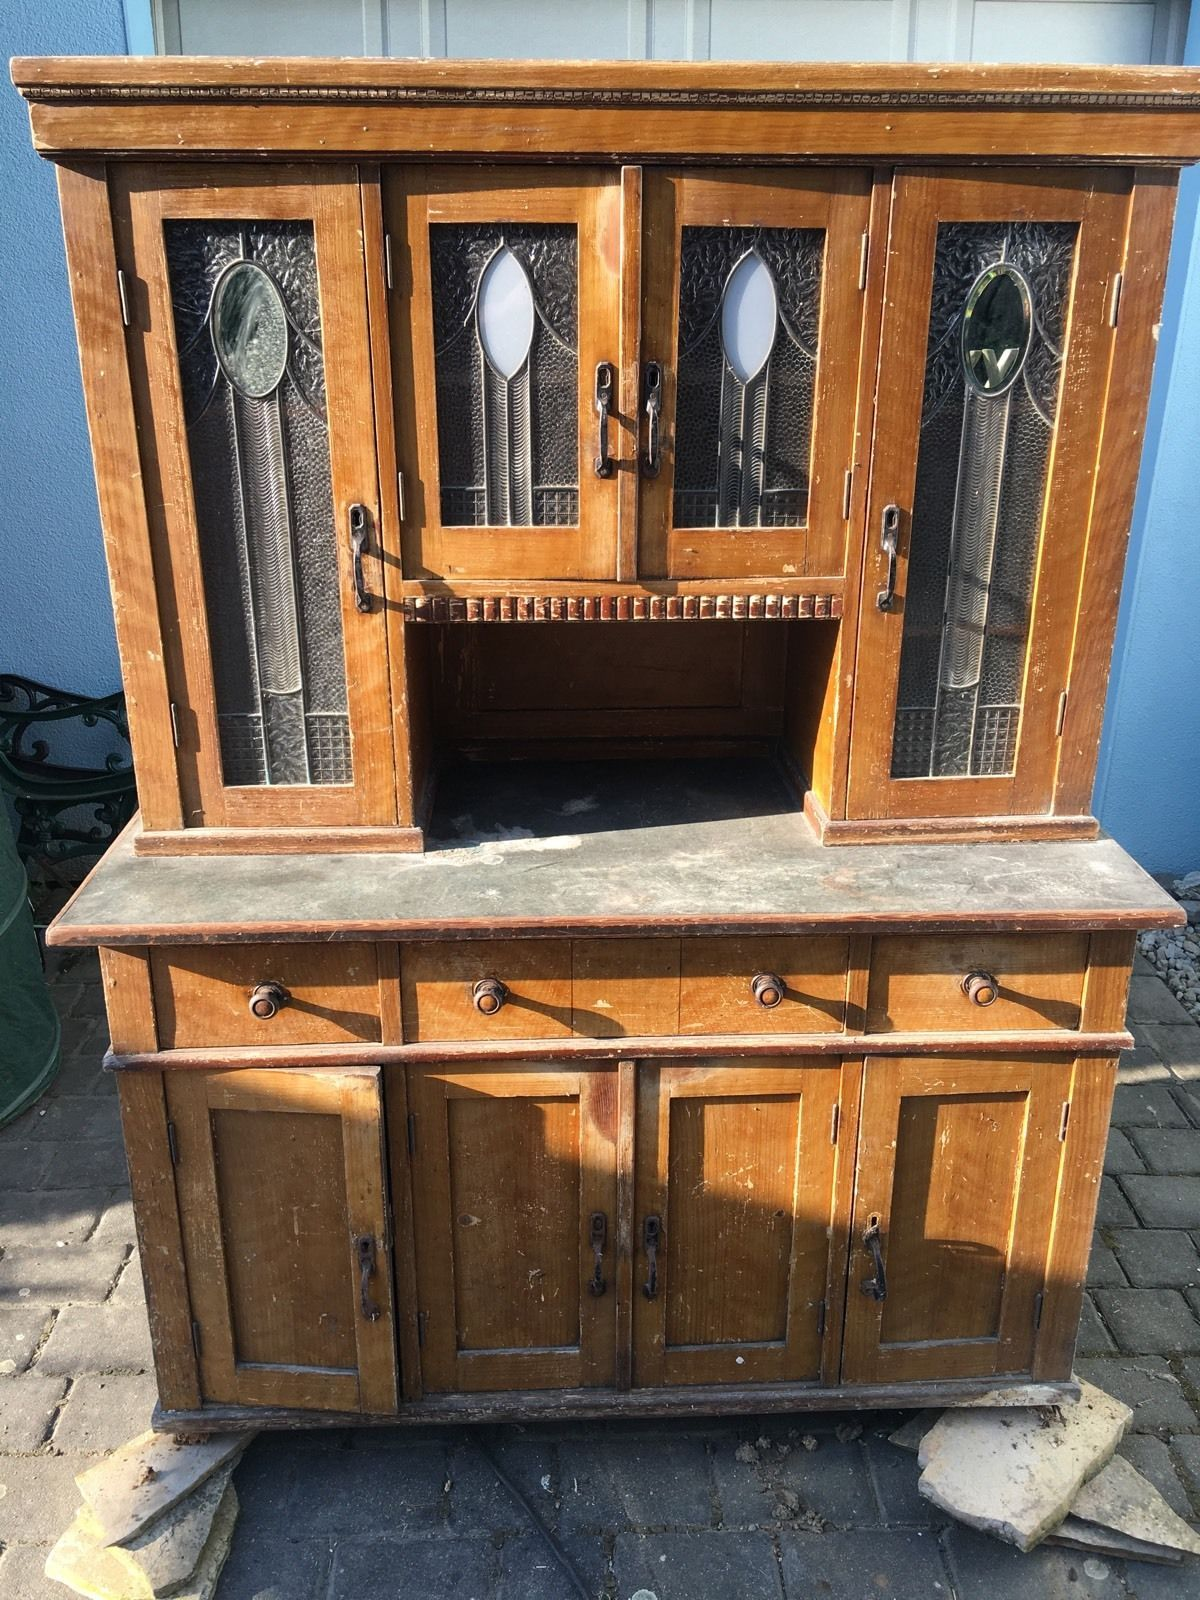 Unique Altes Antikes K chen Buffet Holz Bleiglas Anrichte Schrank